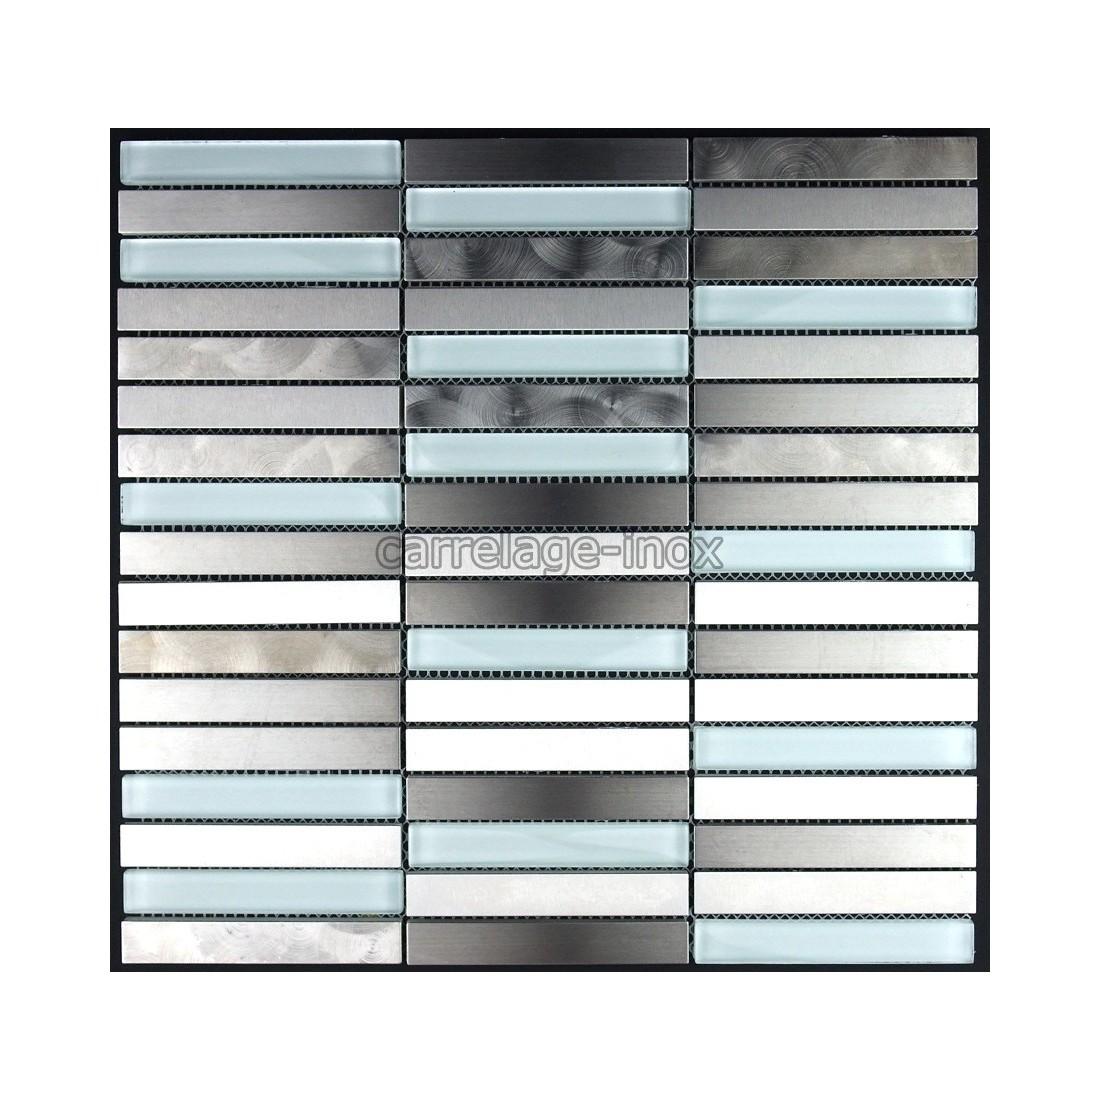 Mosaique inox verre carrelage credence faience multiliner for Credence inox verre